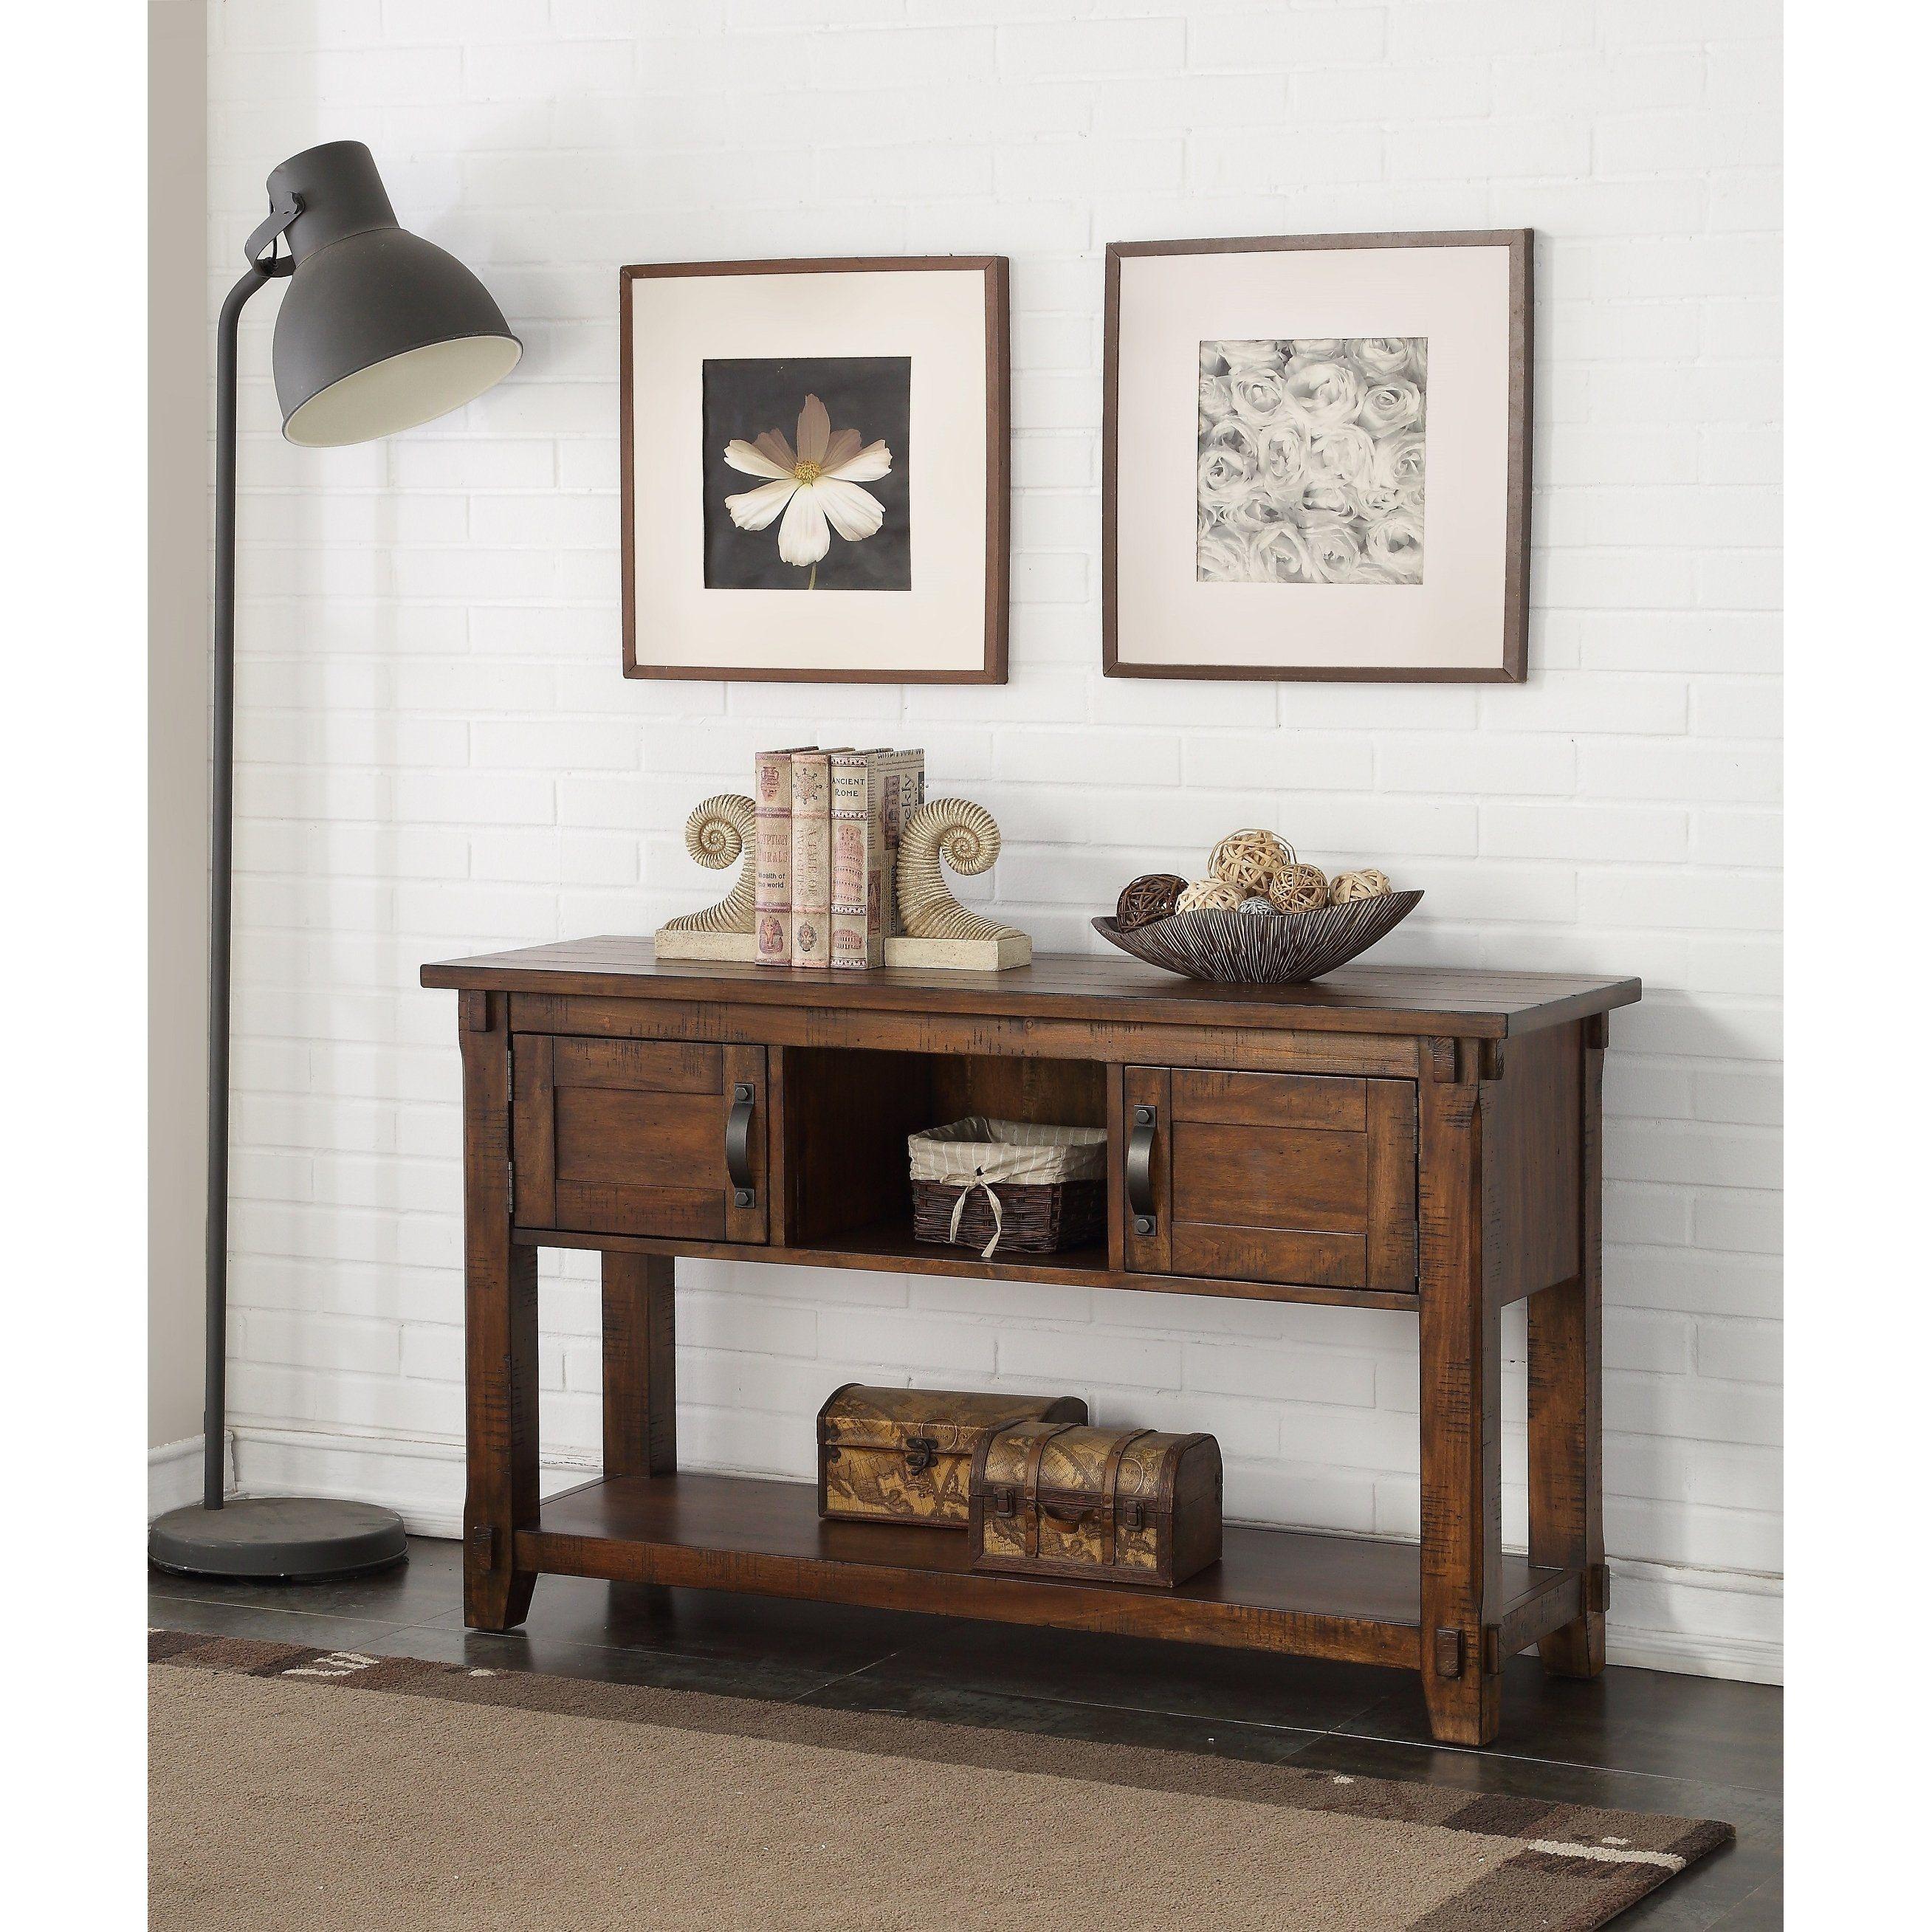 Remarkable Carbon Loft Ebersole Walnut Brown Wood Rustic Sofa Table Inzonedesignstudio Interior Chair Design Inzonedesignstudiocom